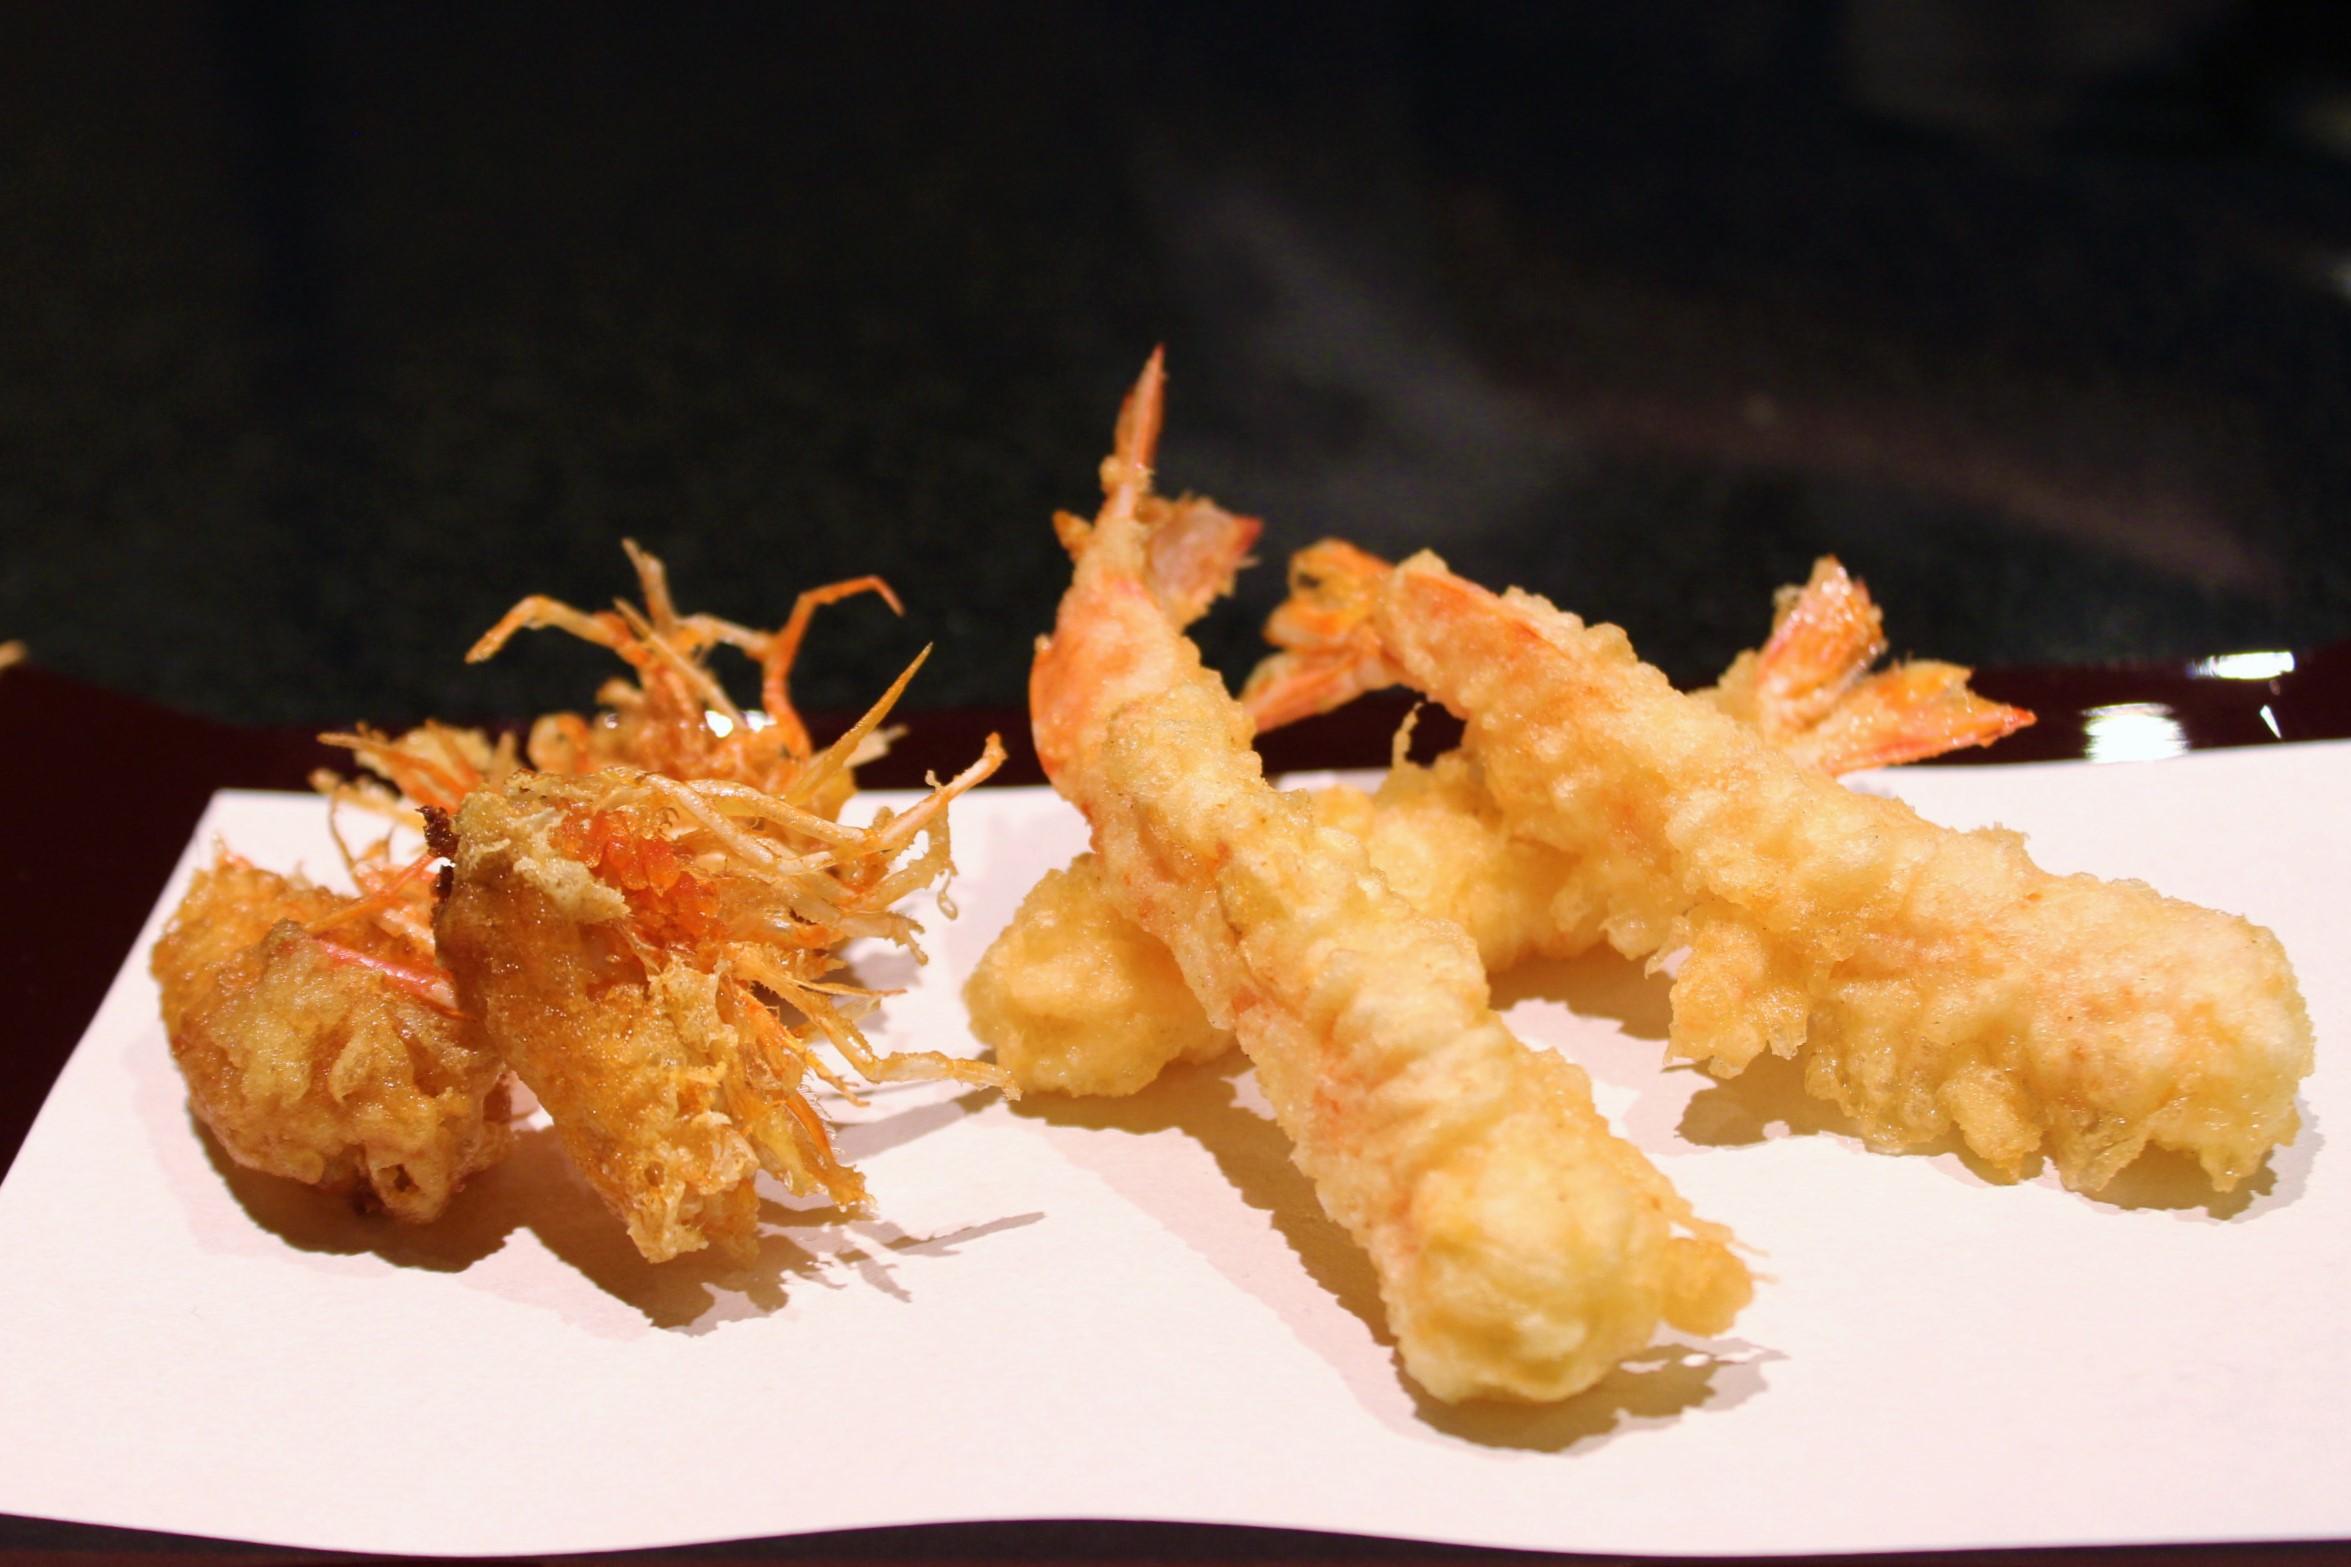 Shrimp Tempura Heads and Bodies